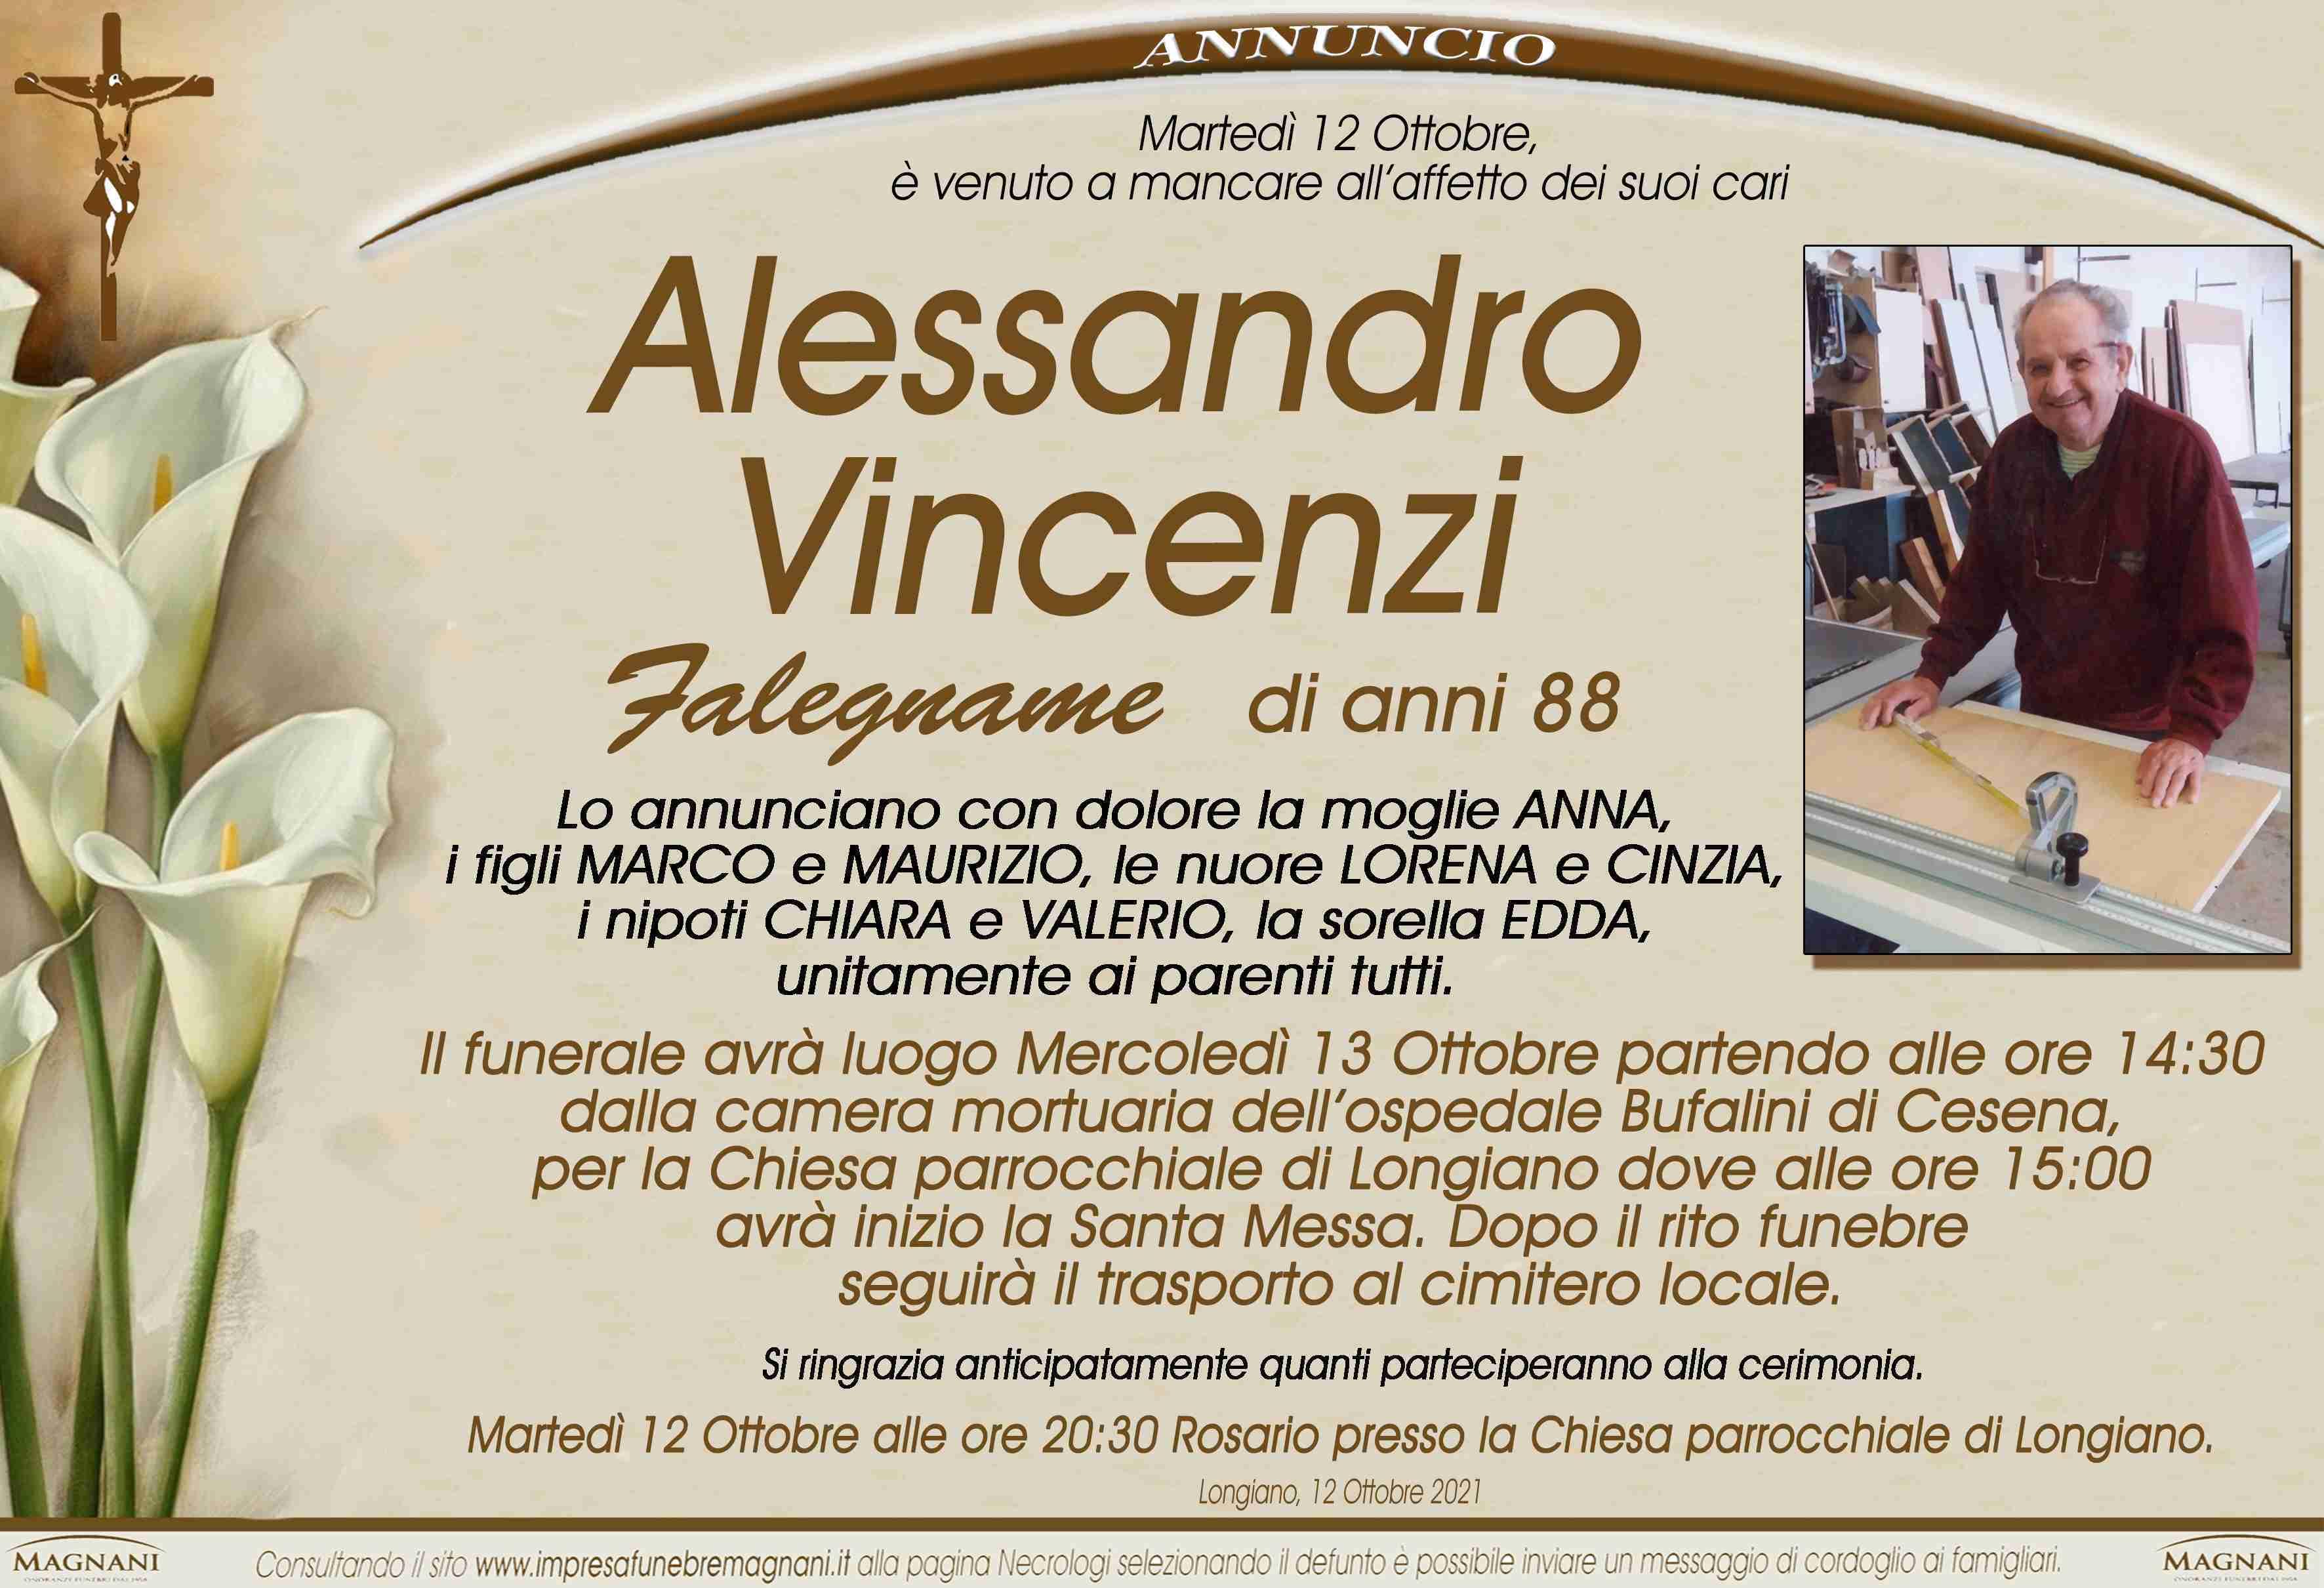 Alessandro Vincenzi